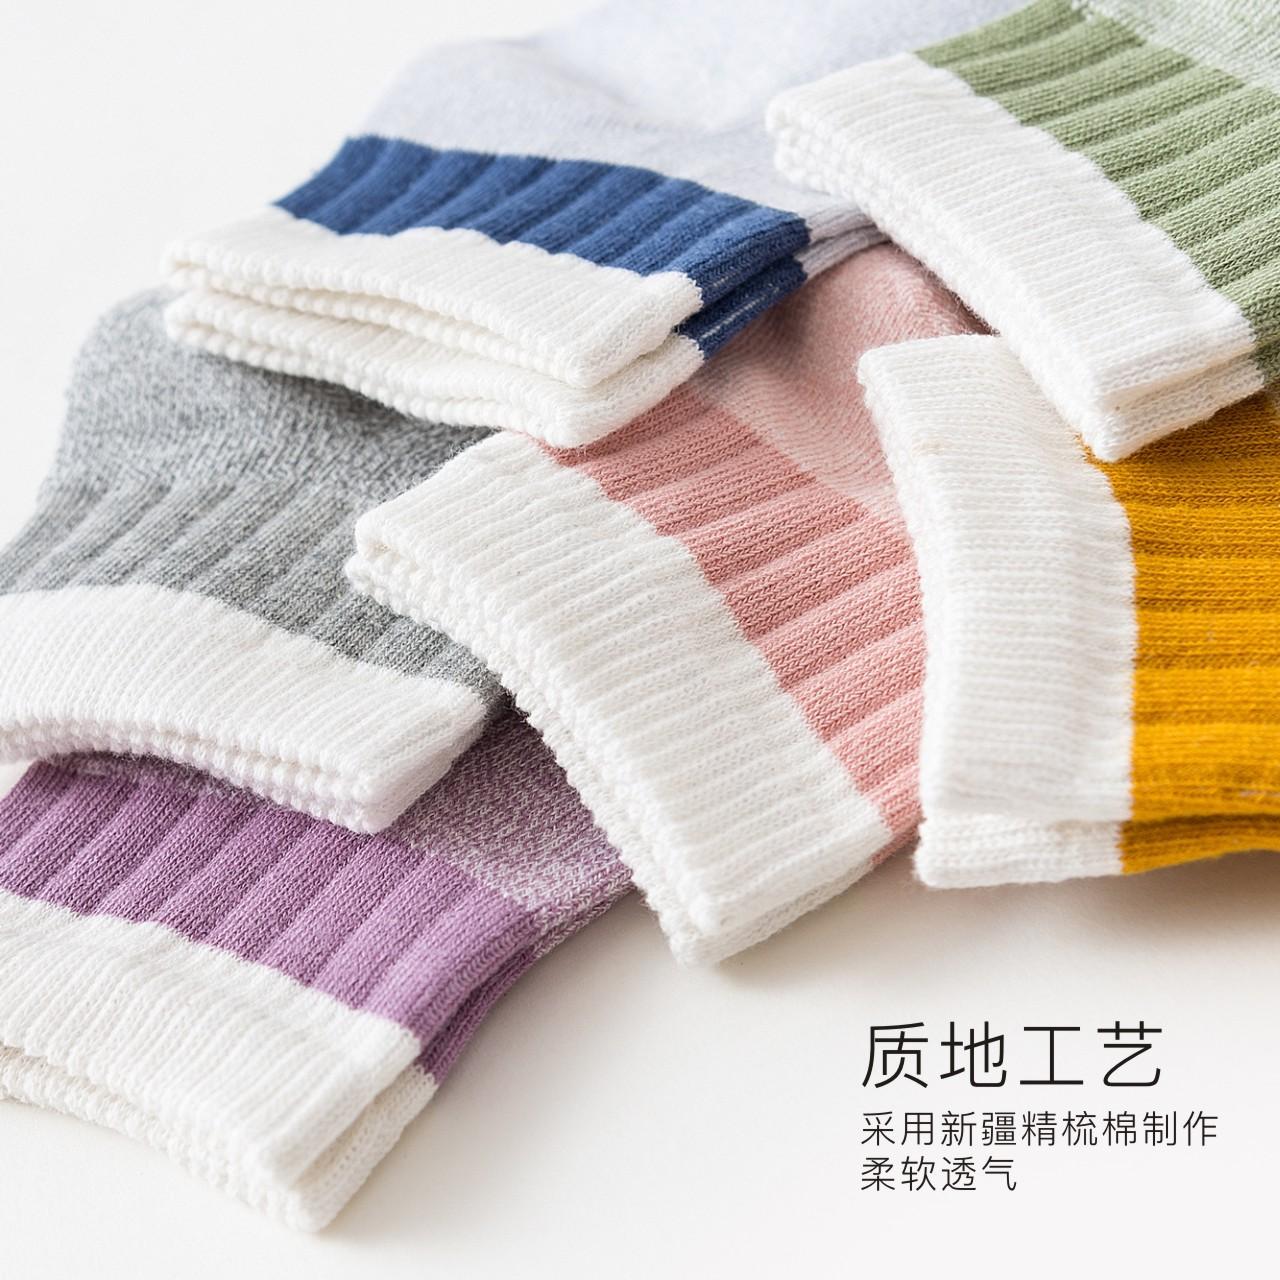 CARAMELLA【买1 送2】袜子女秋冬中筒袜可爱卡通韩版学院风棉袜聚